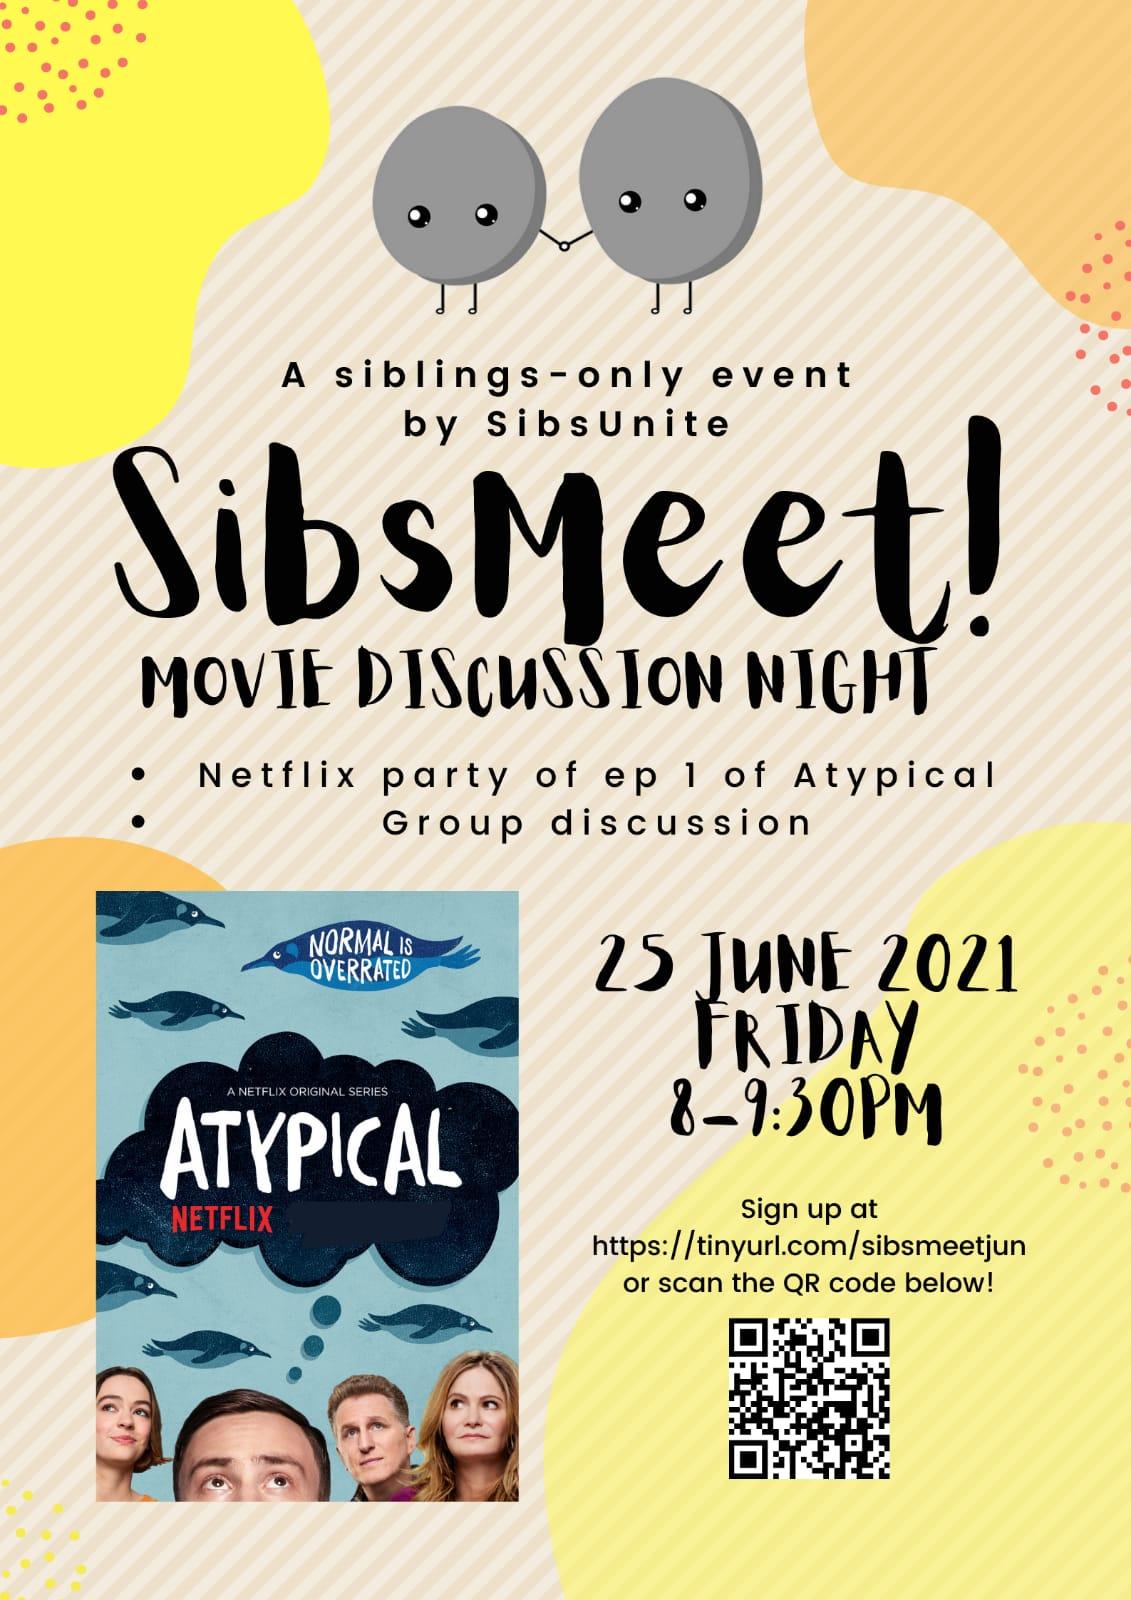 Sibsmeet! Movie Discussion Night